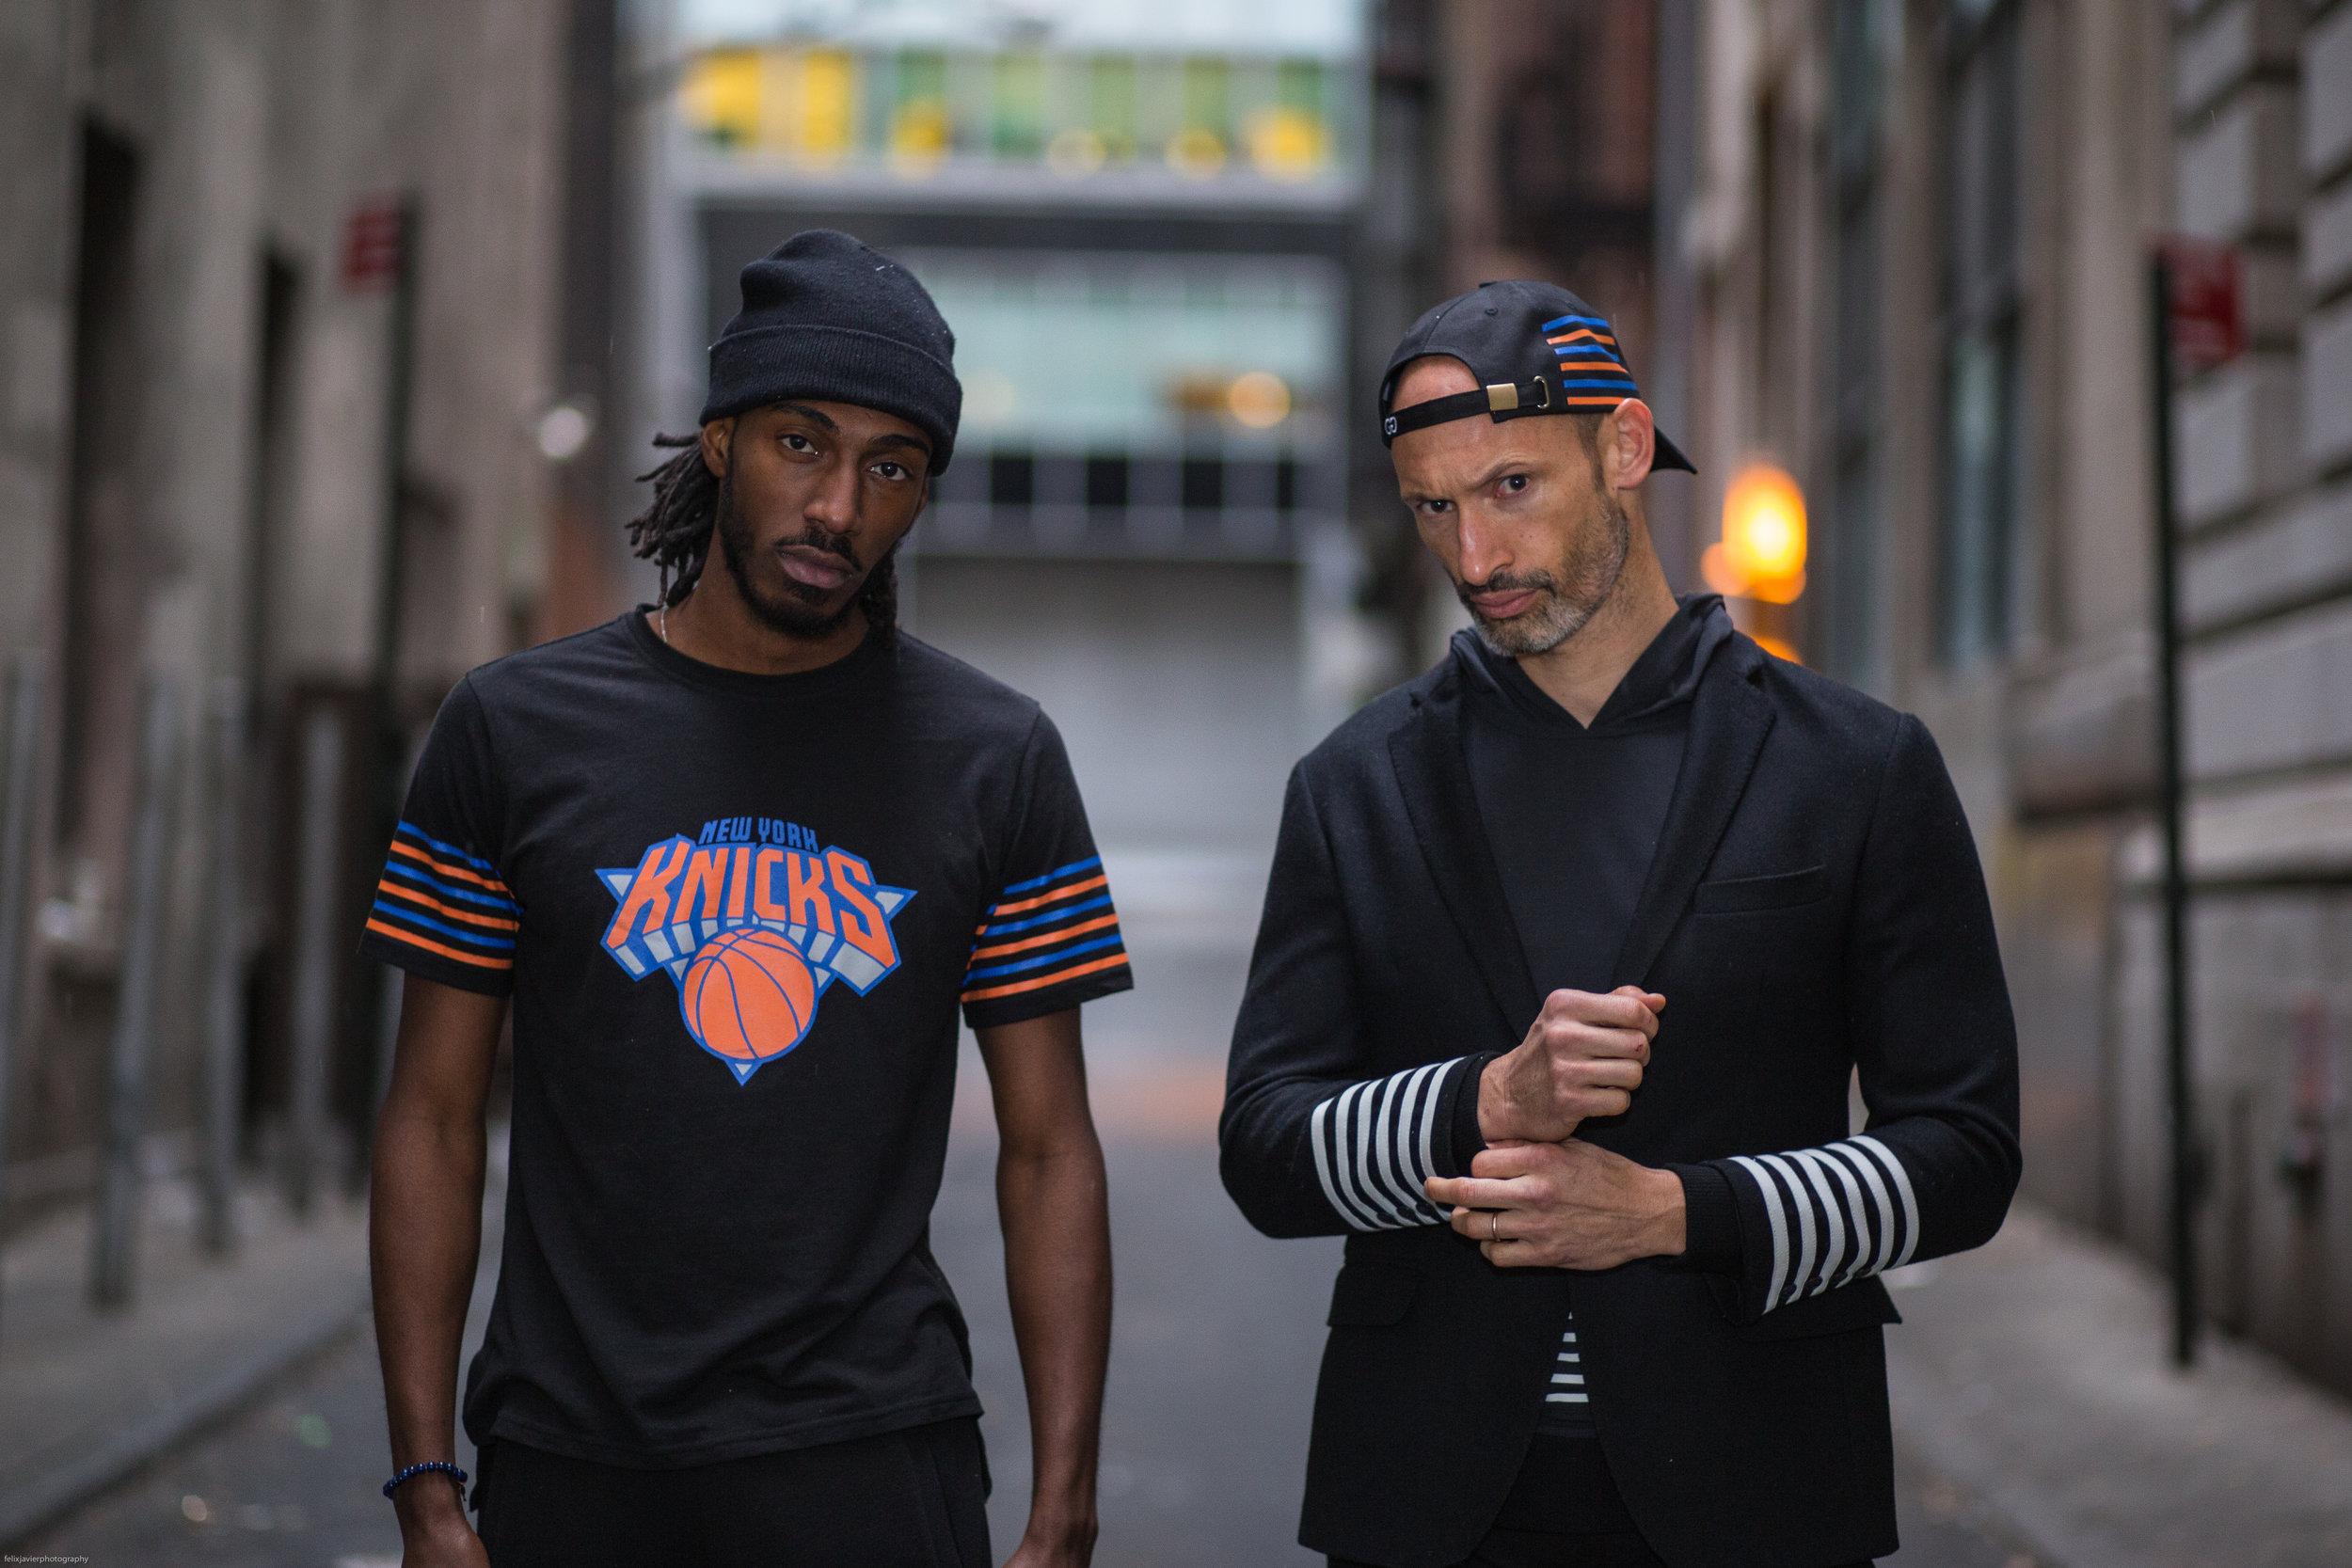 Grungy Gentleman x New York Knicks 9.jpg